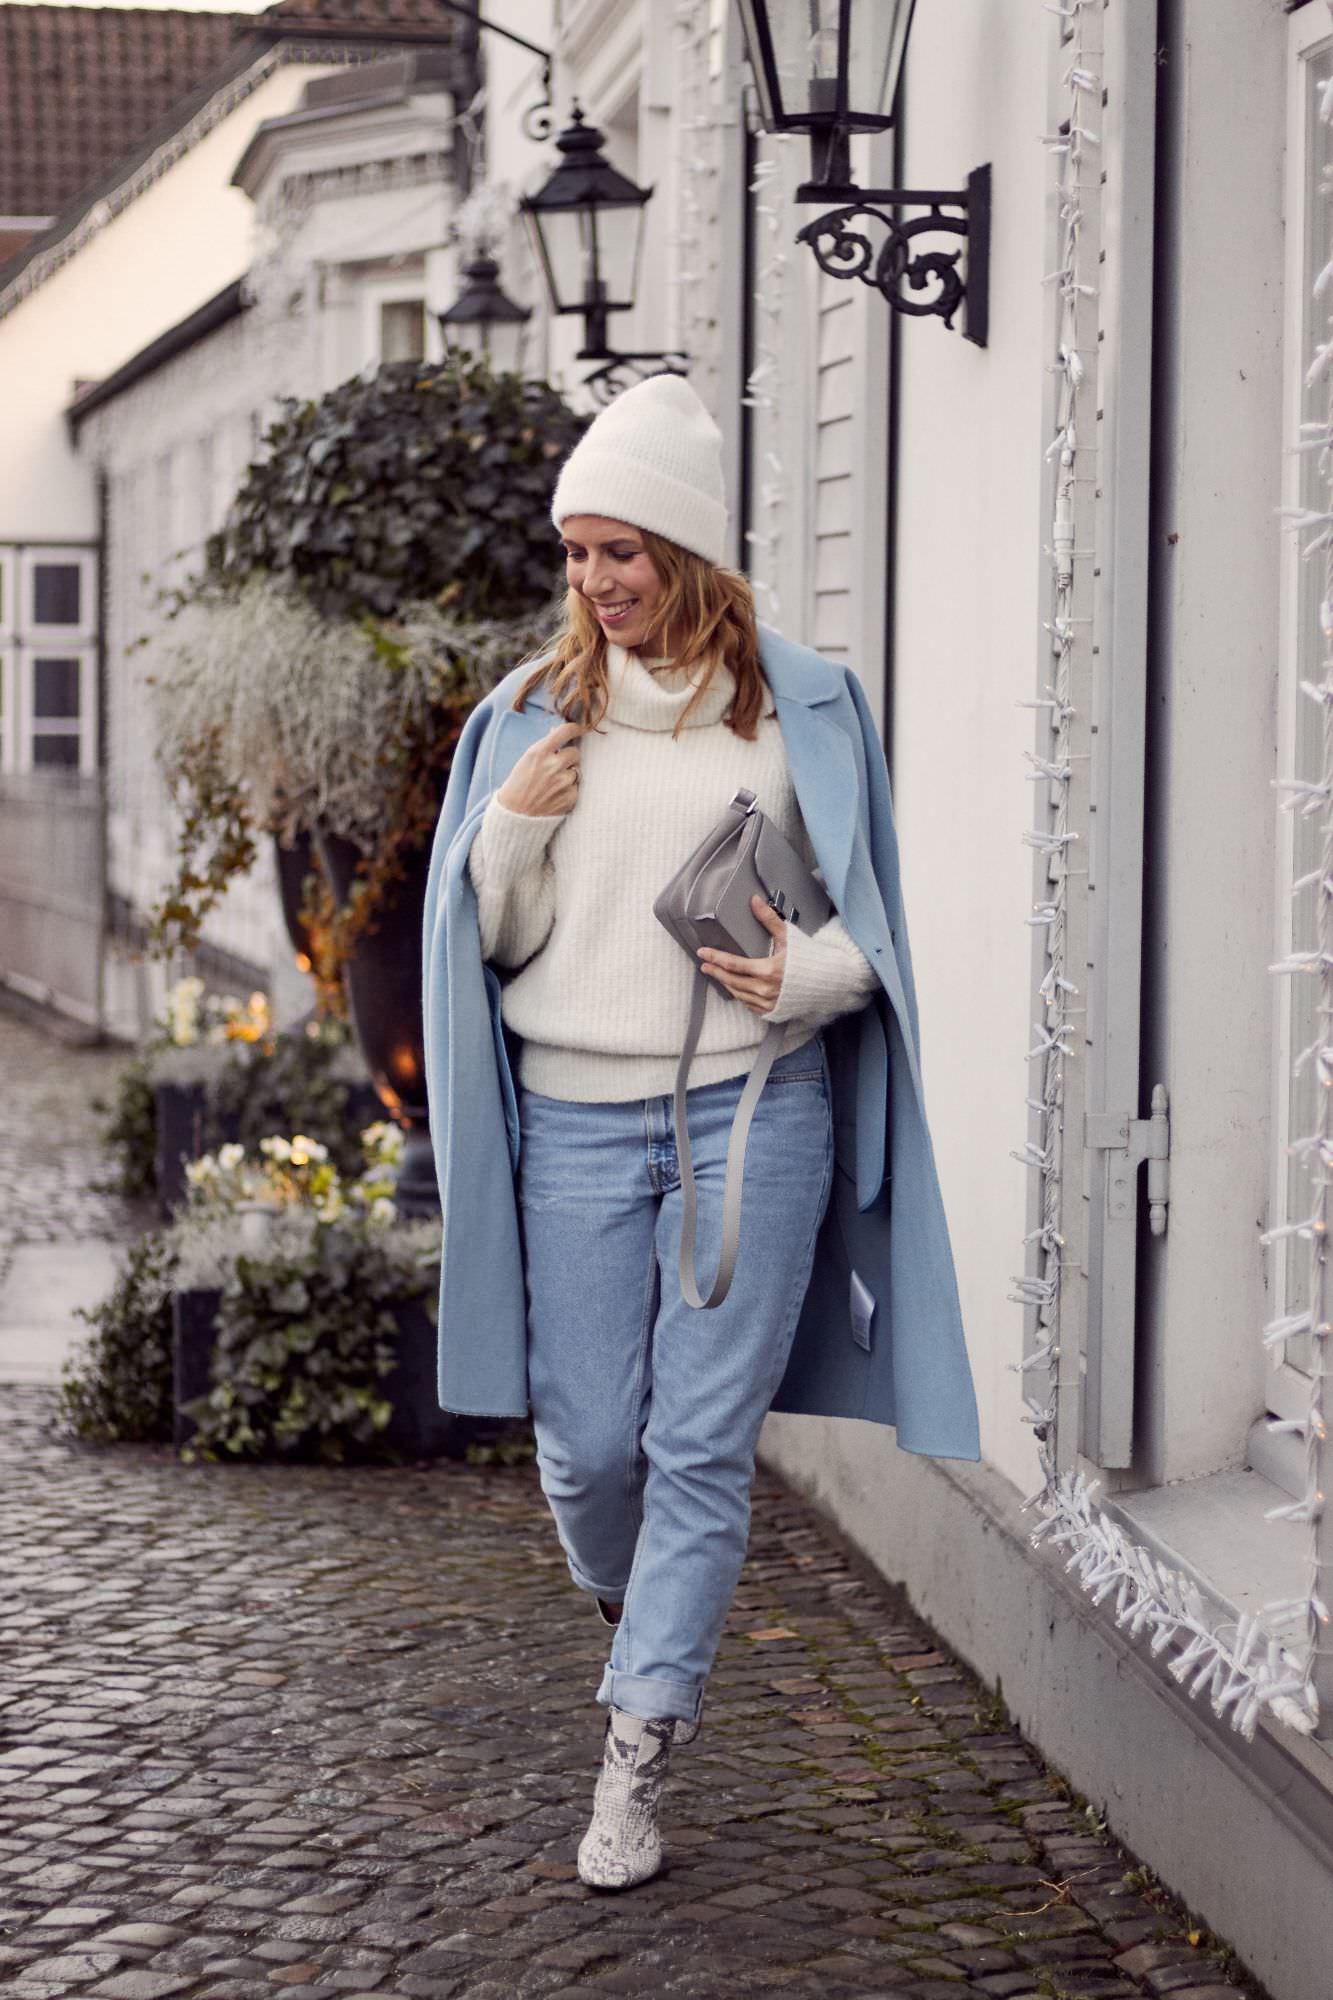 Pantone Farbe 2020 Classic Blue Winter Look mit Mantel in faded denim